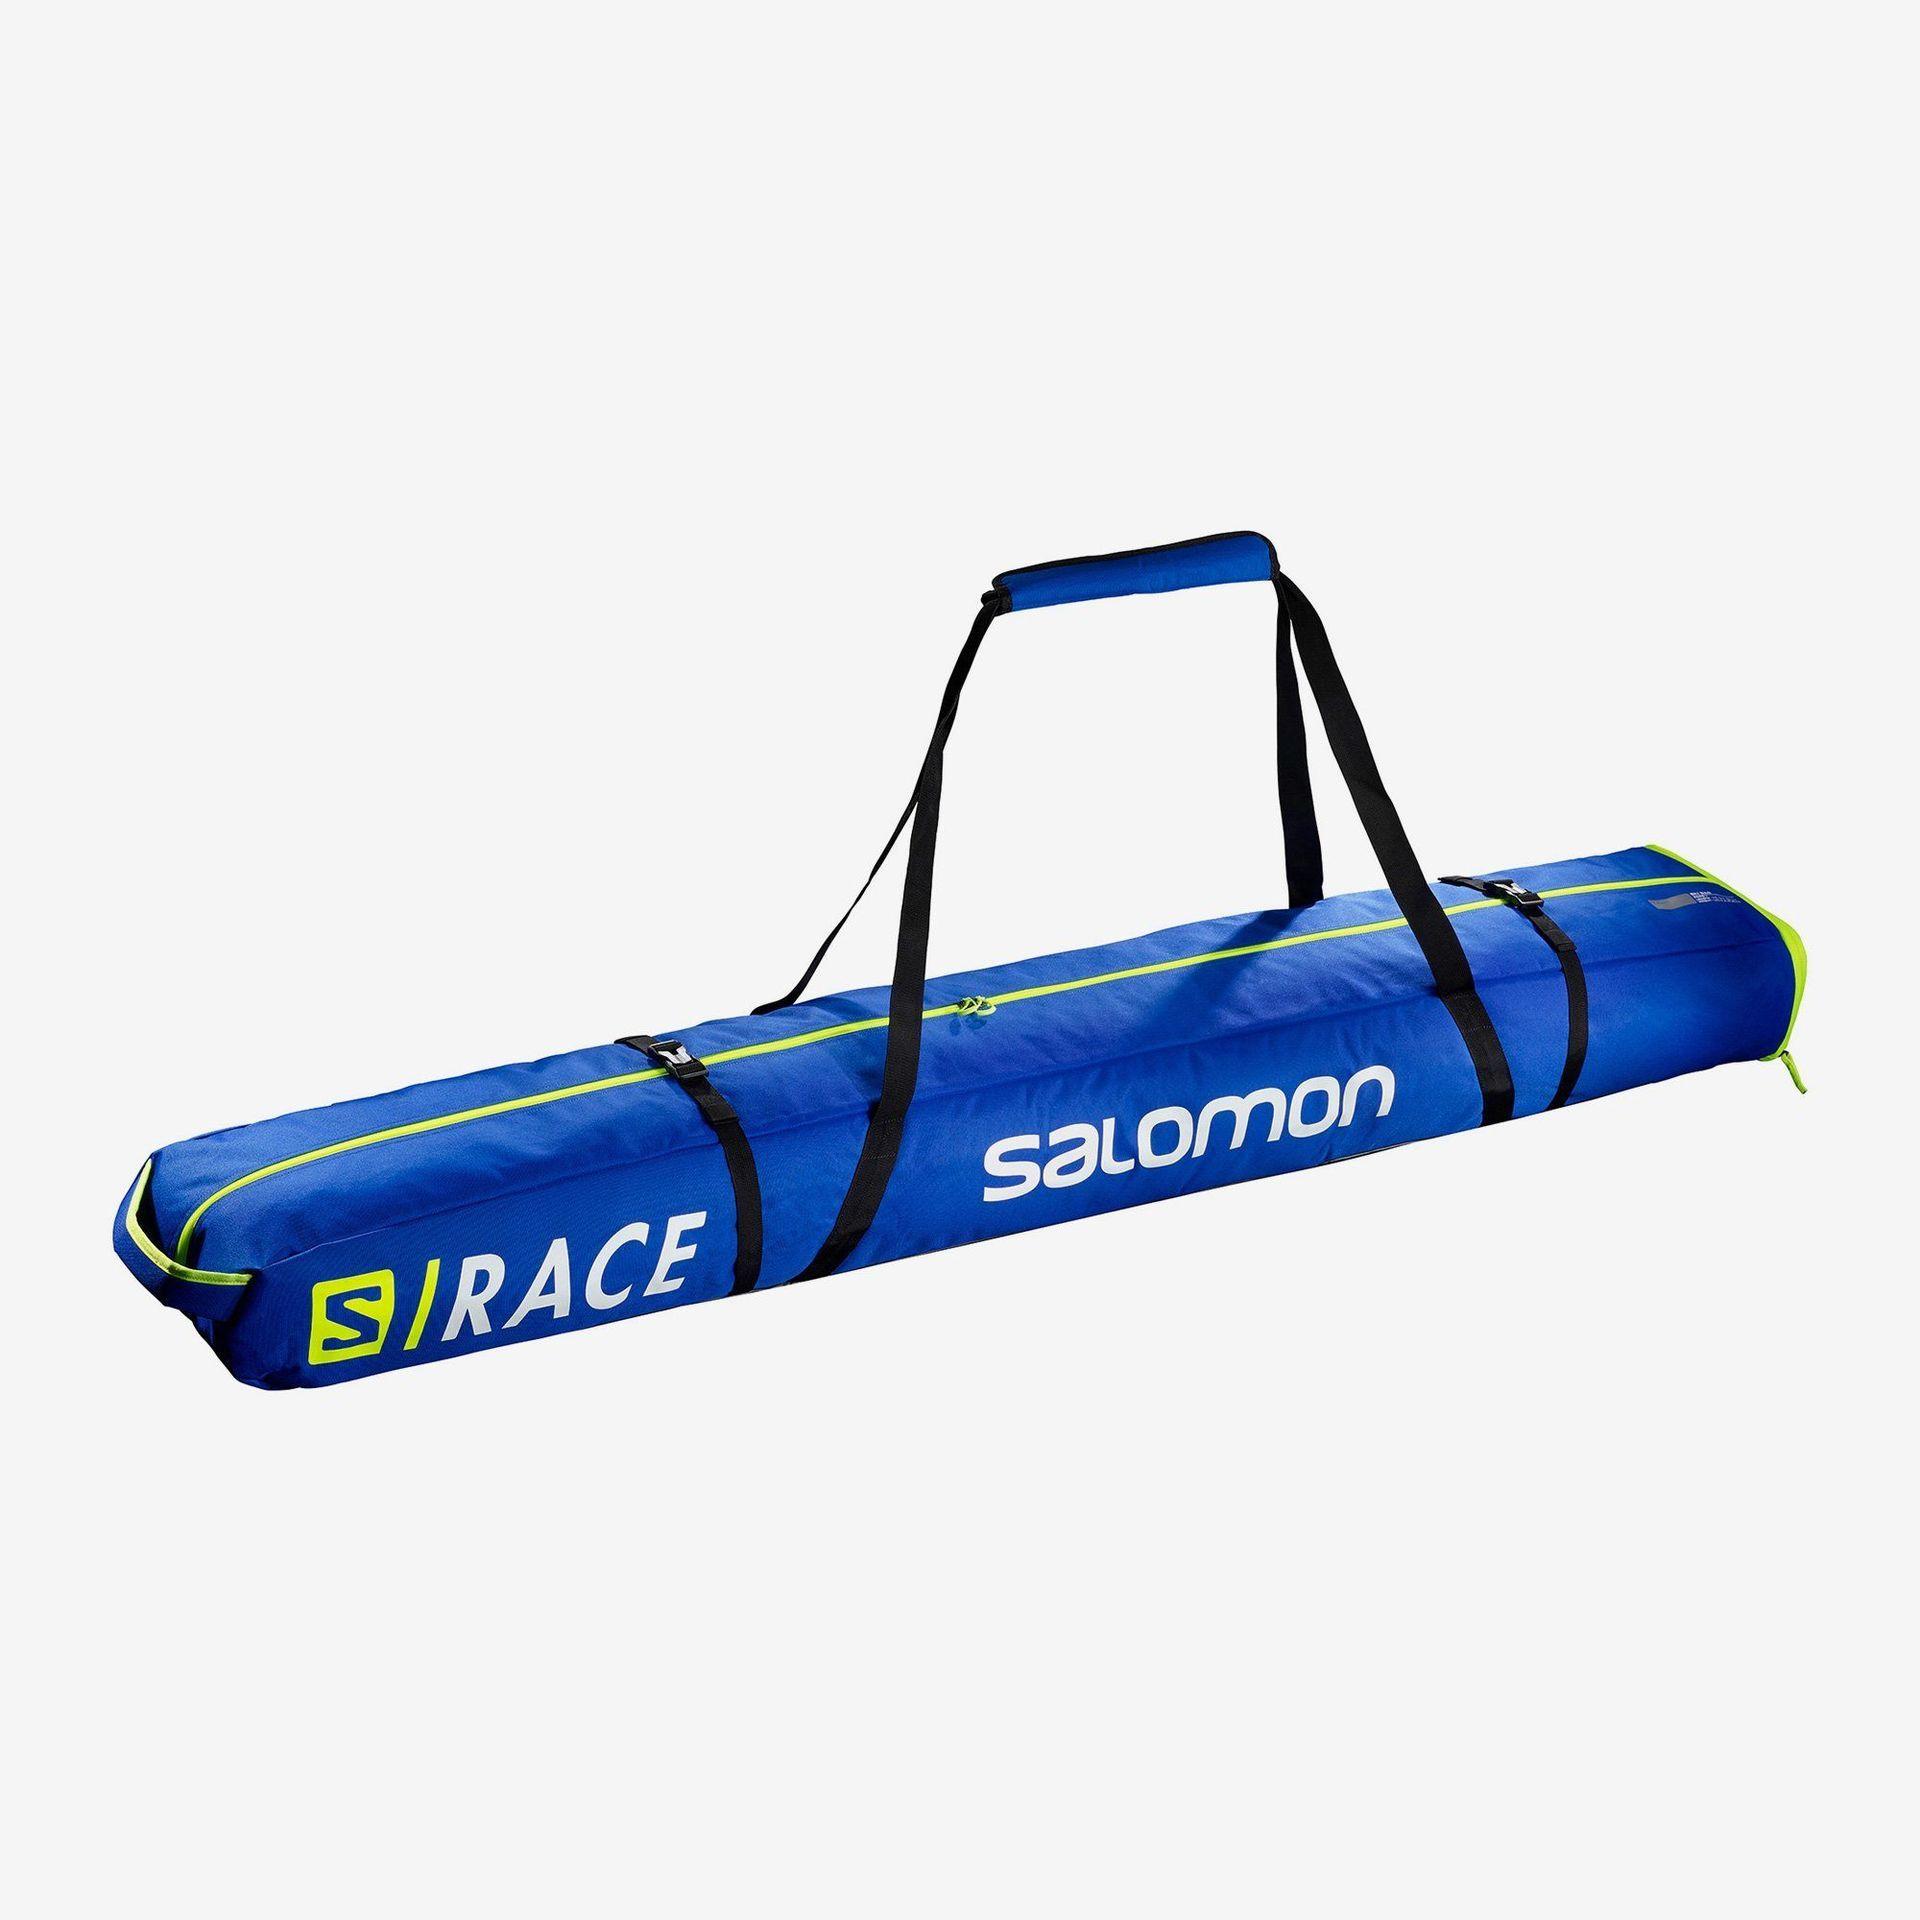 POKROWIEC NA NARTY SALOMON EXTEND 2PAIRS 175+20 SKIBAG RACE BLUE YELLOW 116860